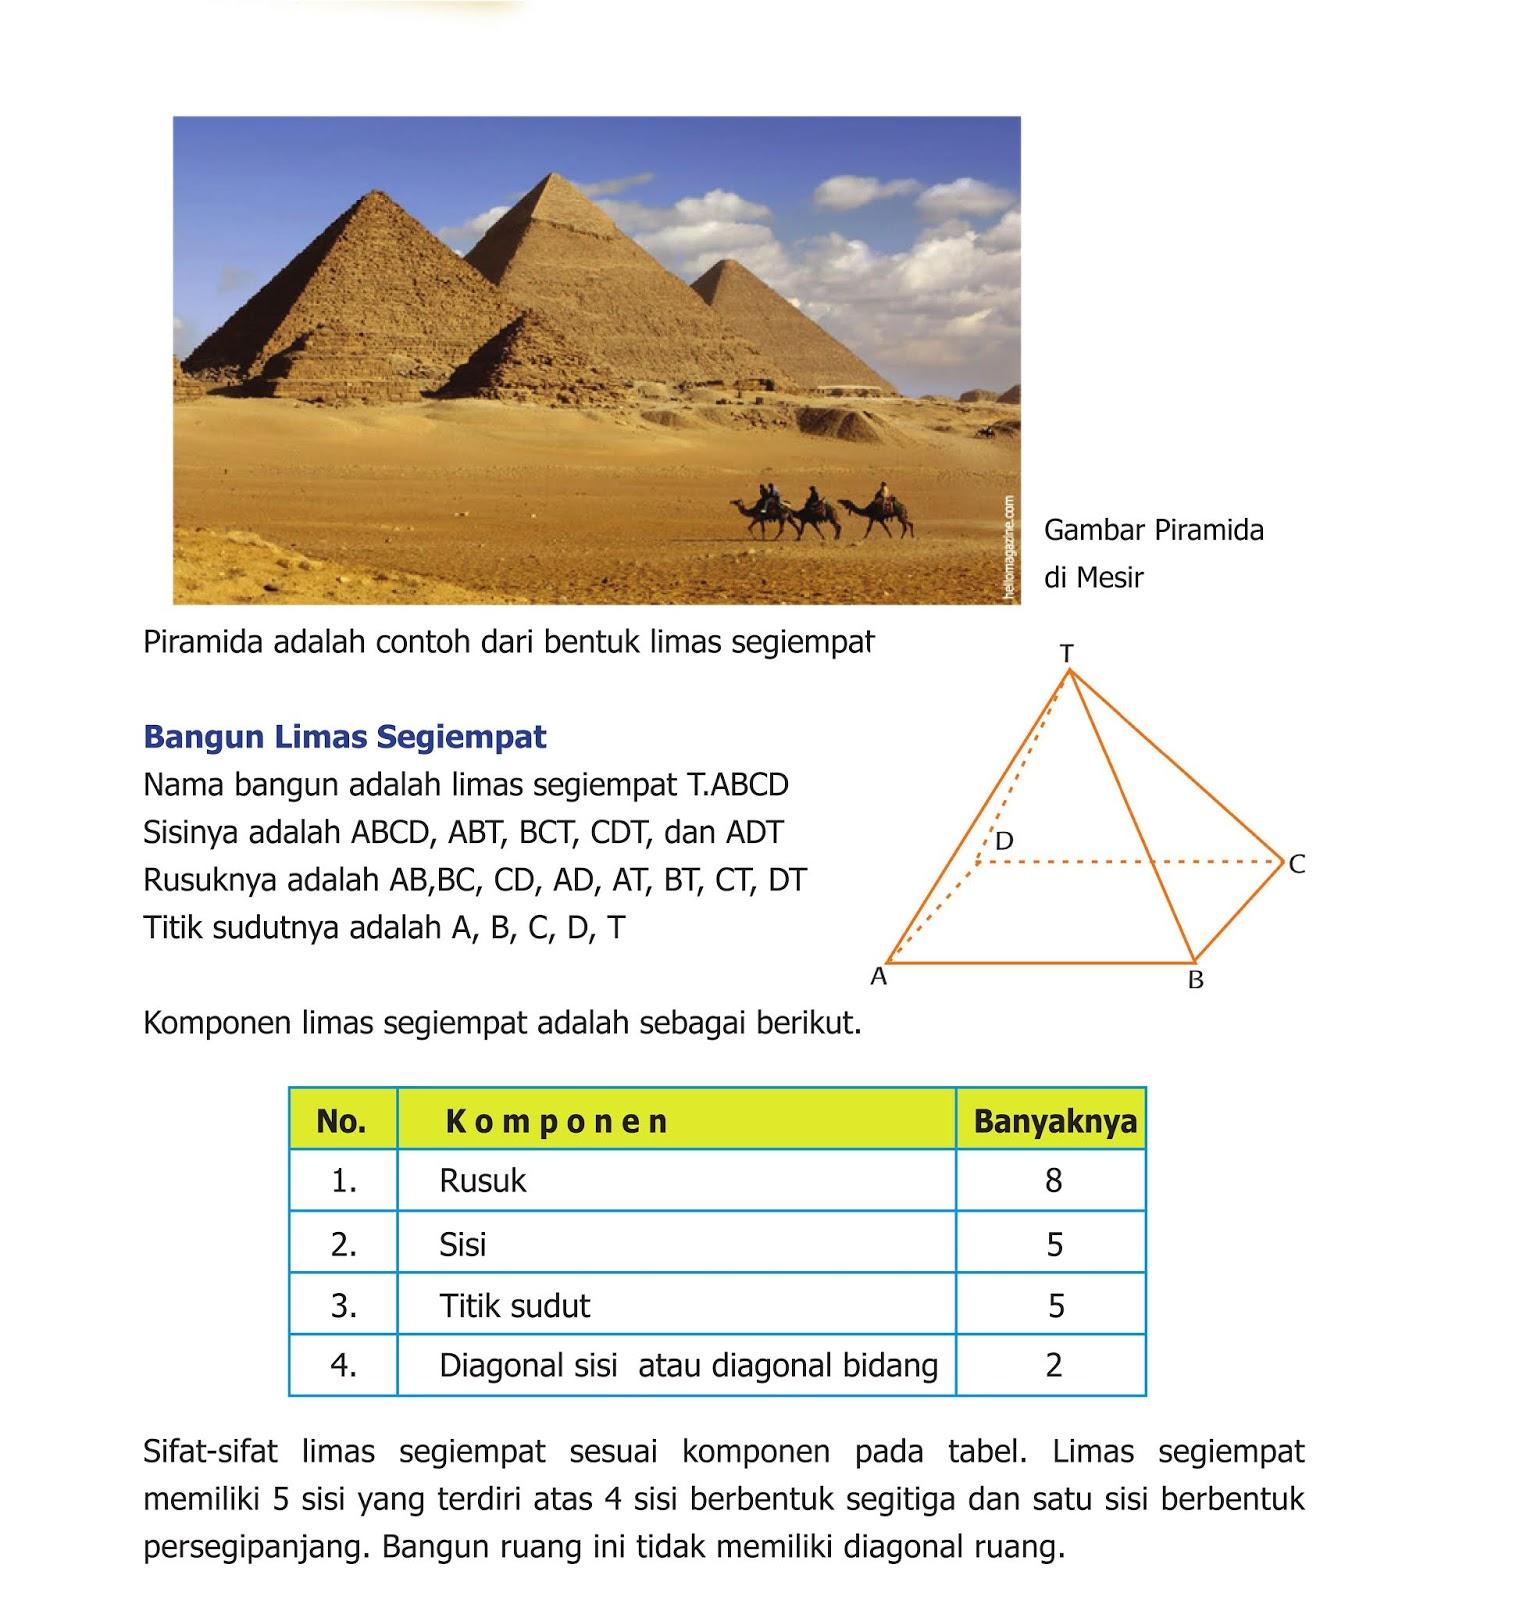 Kunci Jawaban Matematika Kelas 5 Latihan 3 Halaman 10